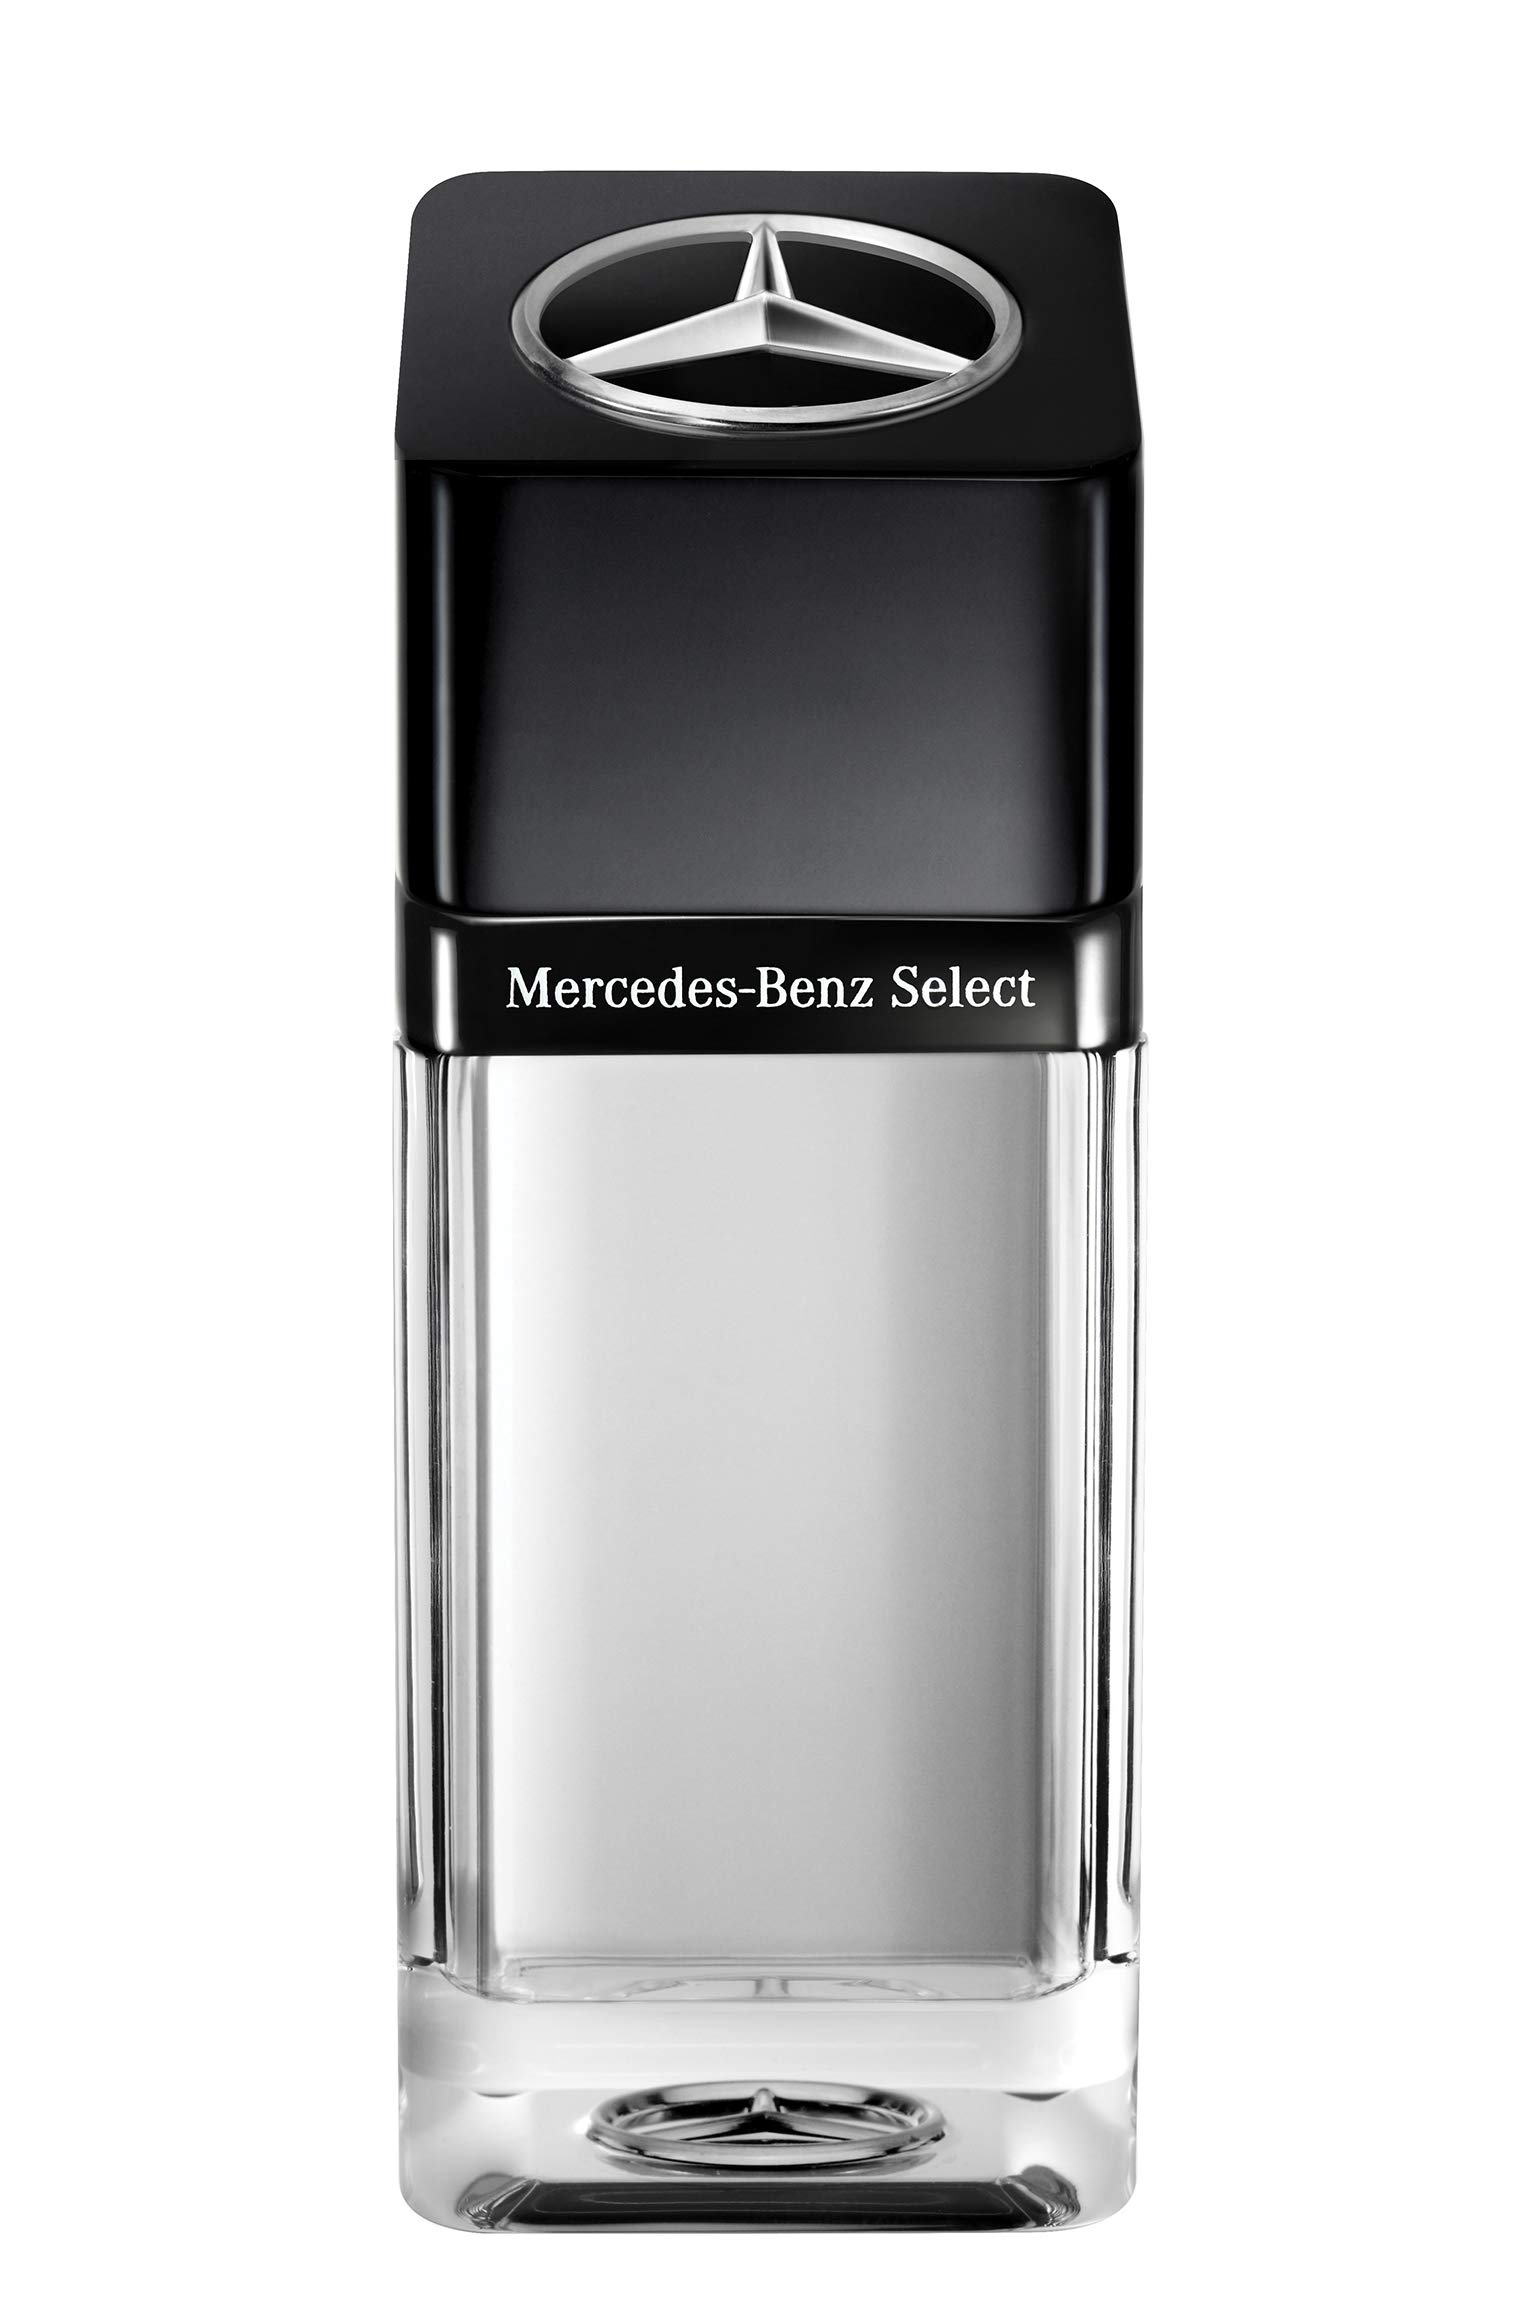 Mercedes-benz Mercedes-benz Select By Mercedes-benz for Men - 3.4 Oz Edt Spray, 3.4 Oz by Mercedes Benz